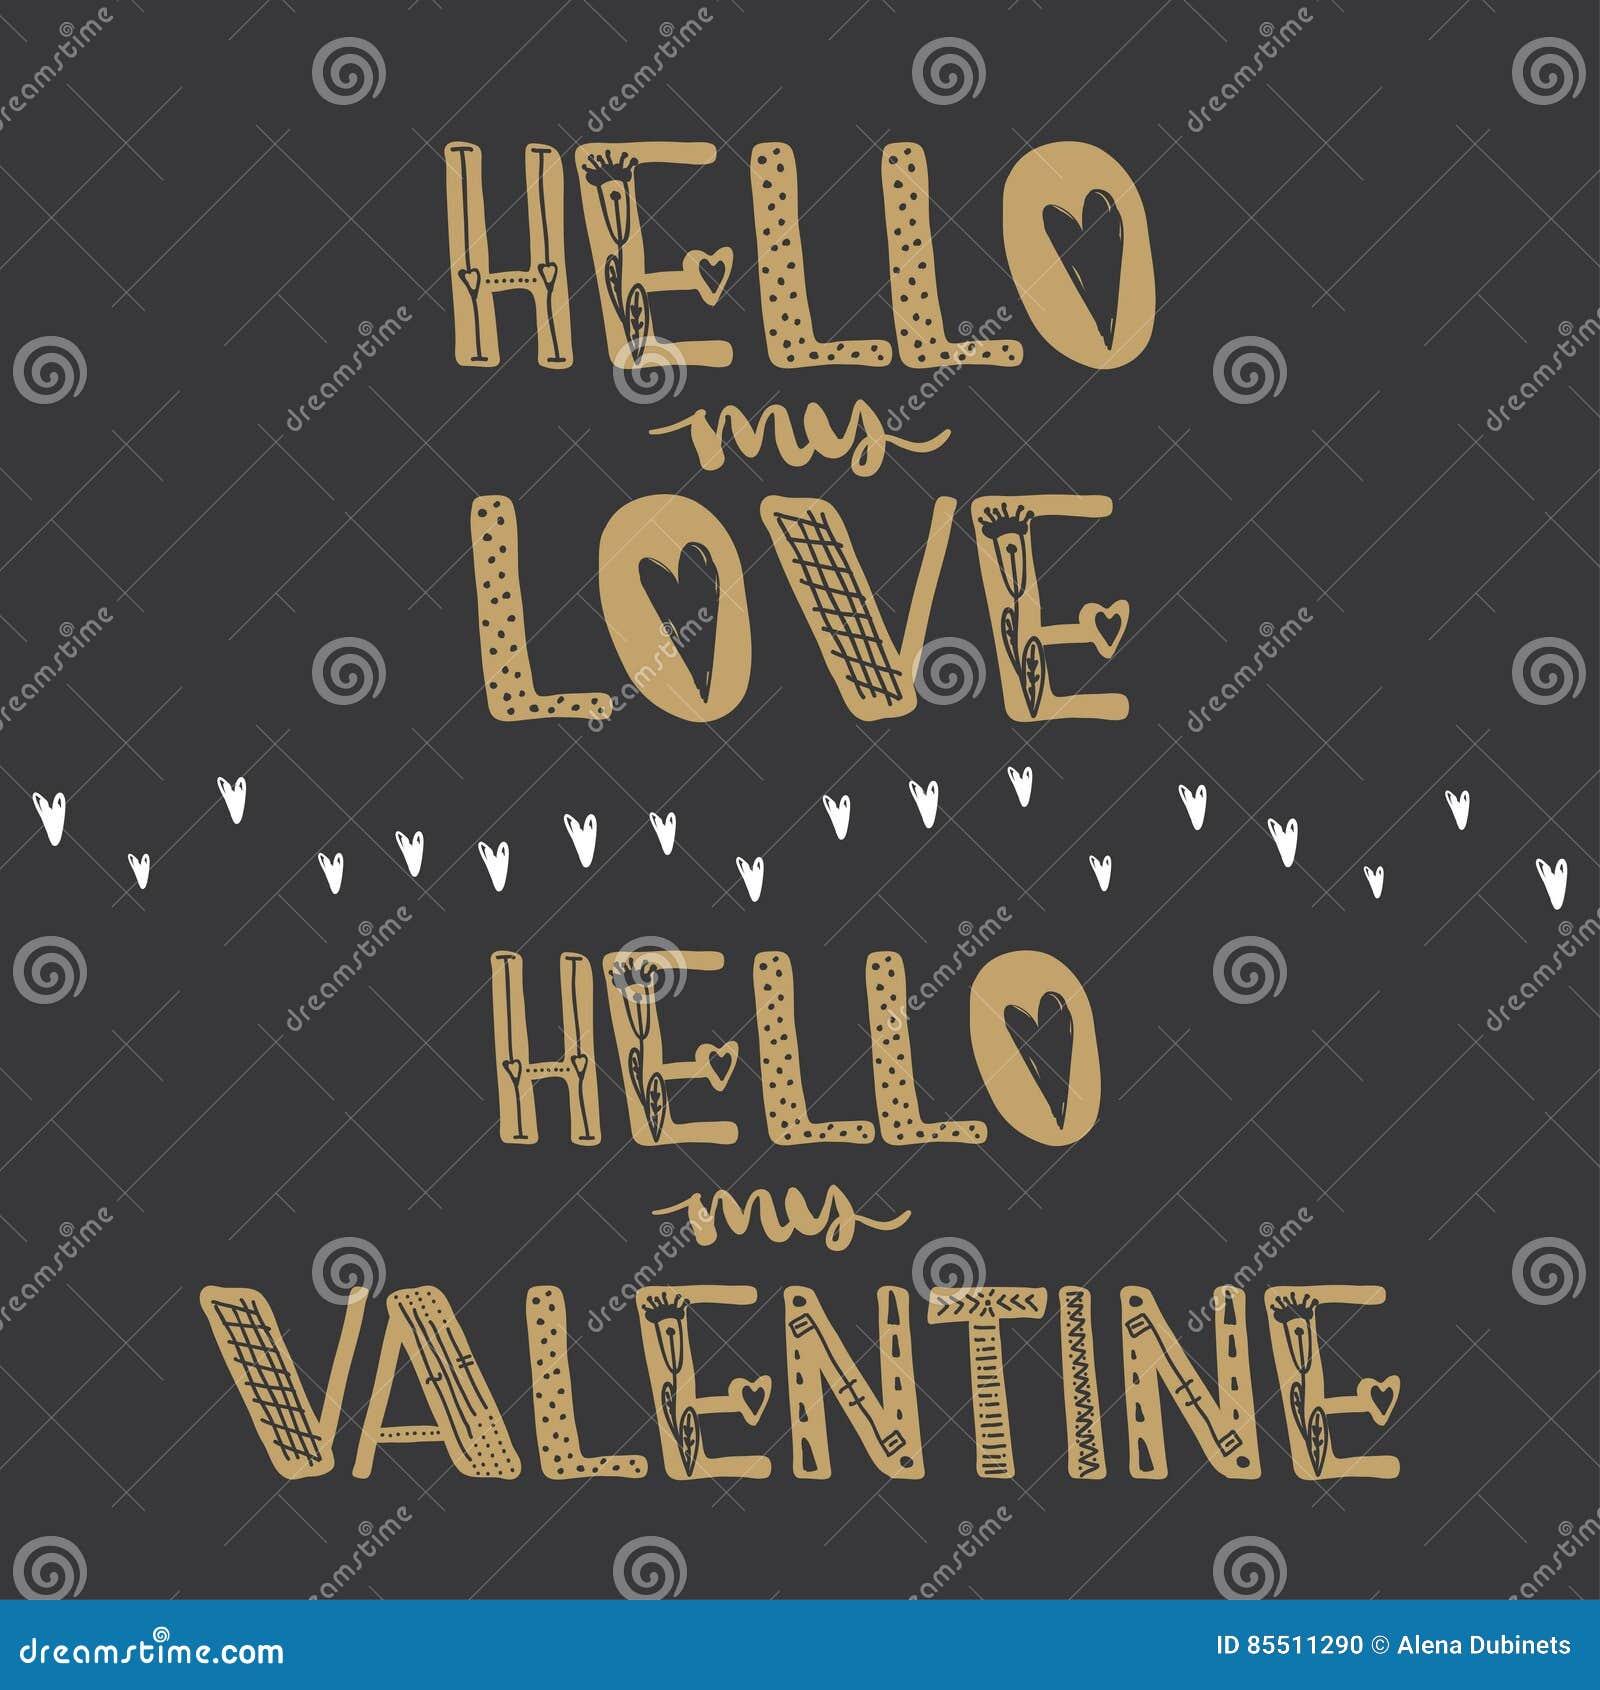 Hello My Love. Hello My Valentine. Motivational Quotes